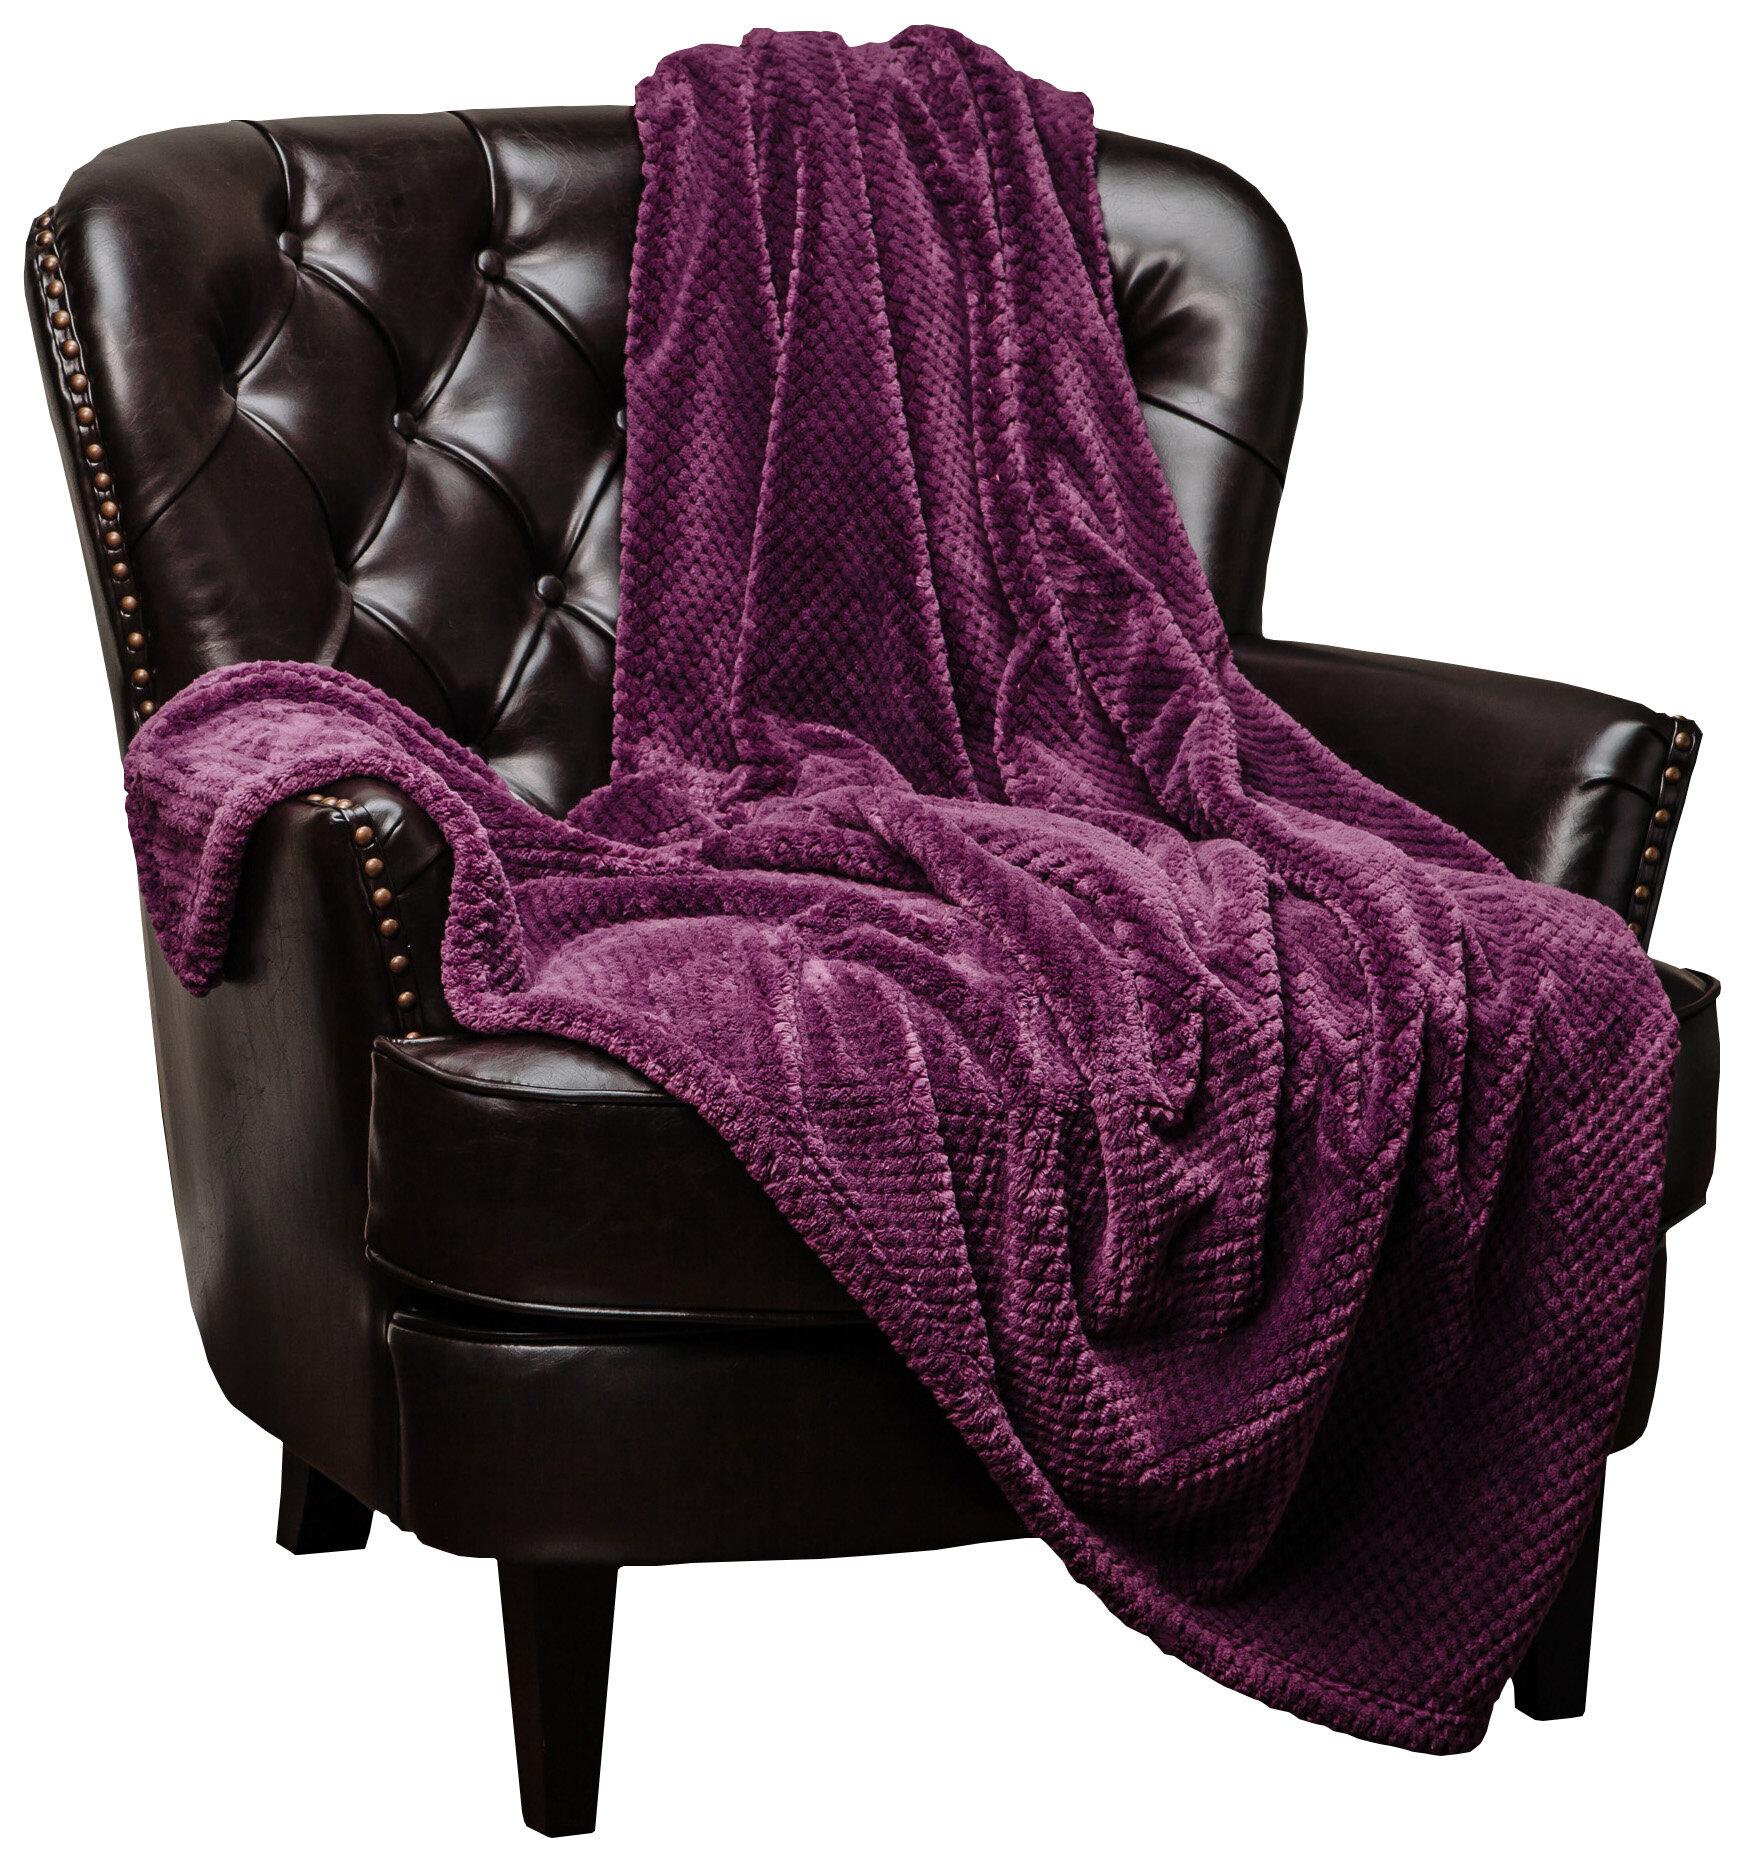 f4ce16fb00 Chanasya Super Soft Warm Elegant Cozy and Decorative Velvet Fleece Throw  Blanket   Reviews